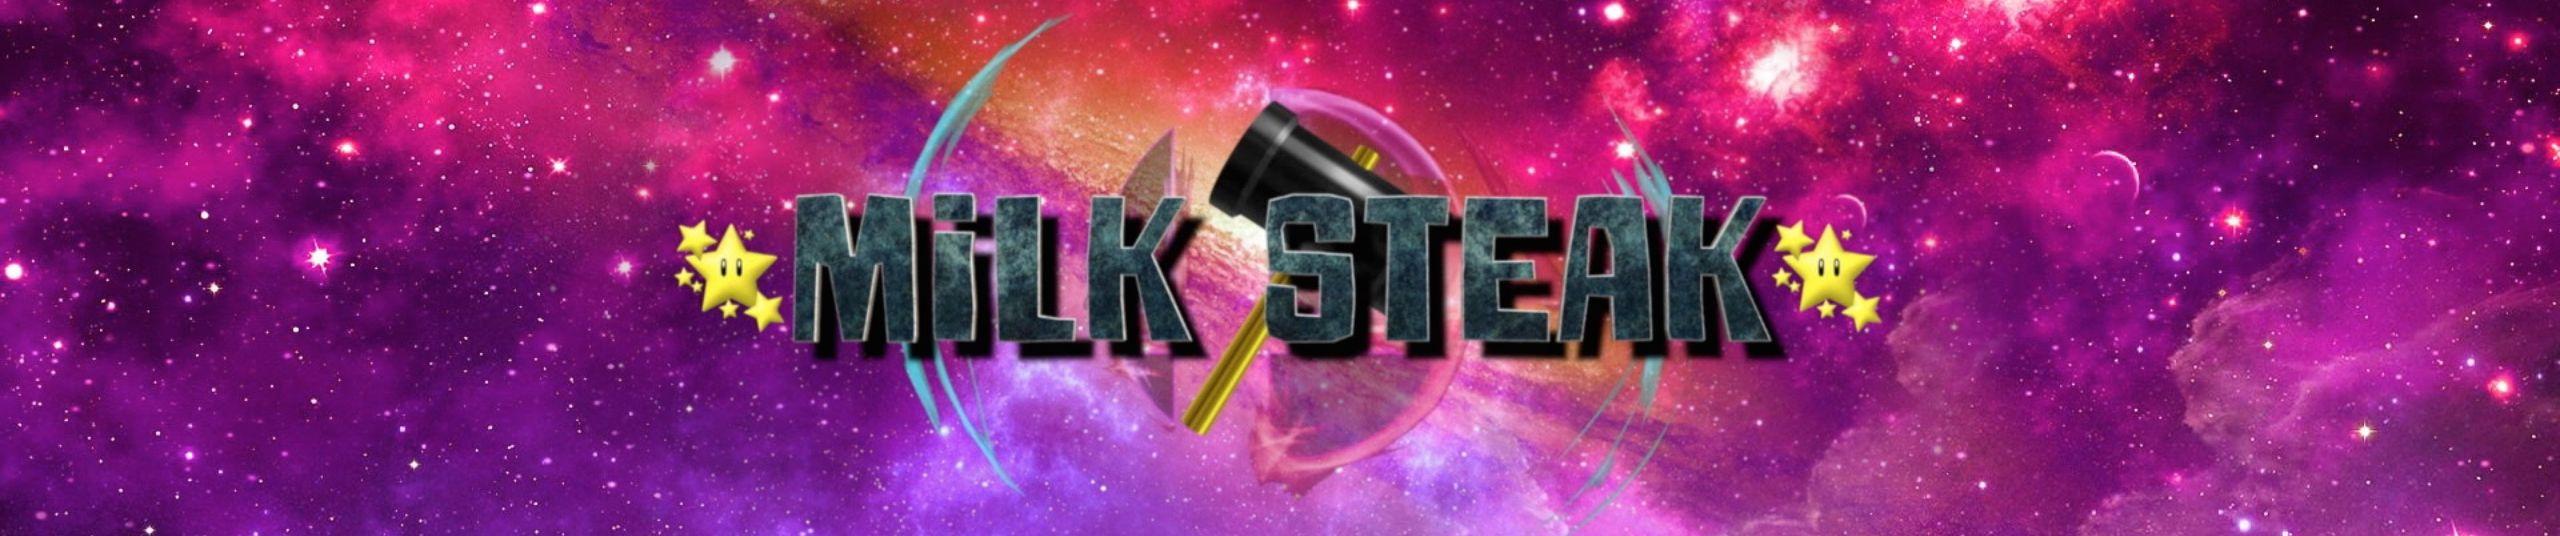 Roblox death sound by Milk Steak   Free Listening on SoundCloud